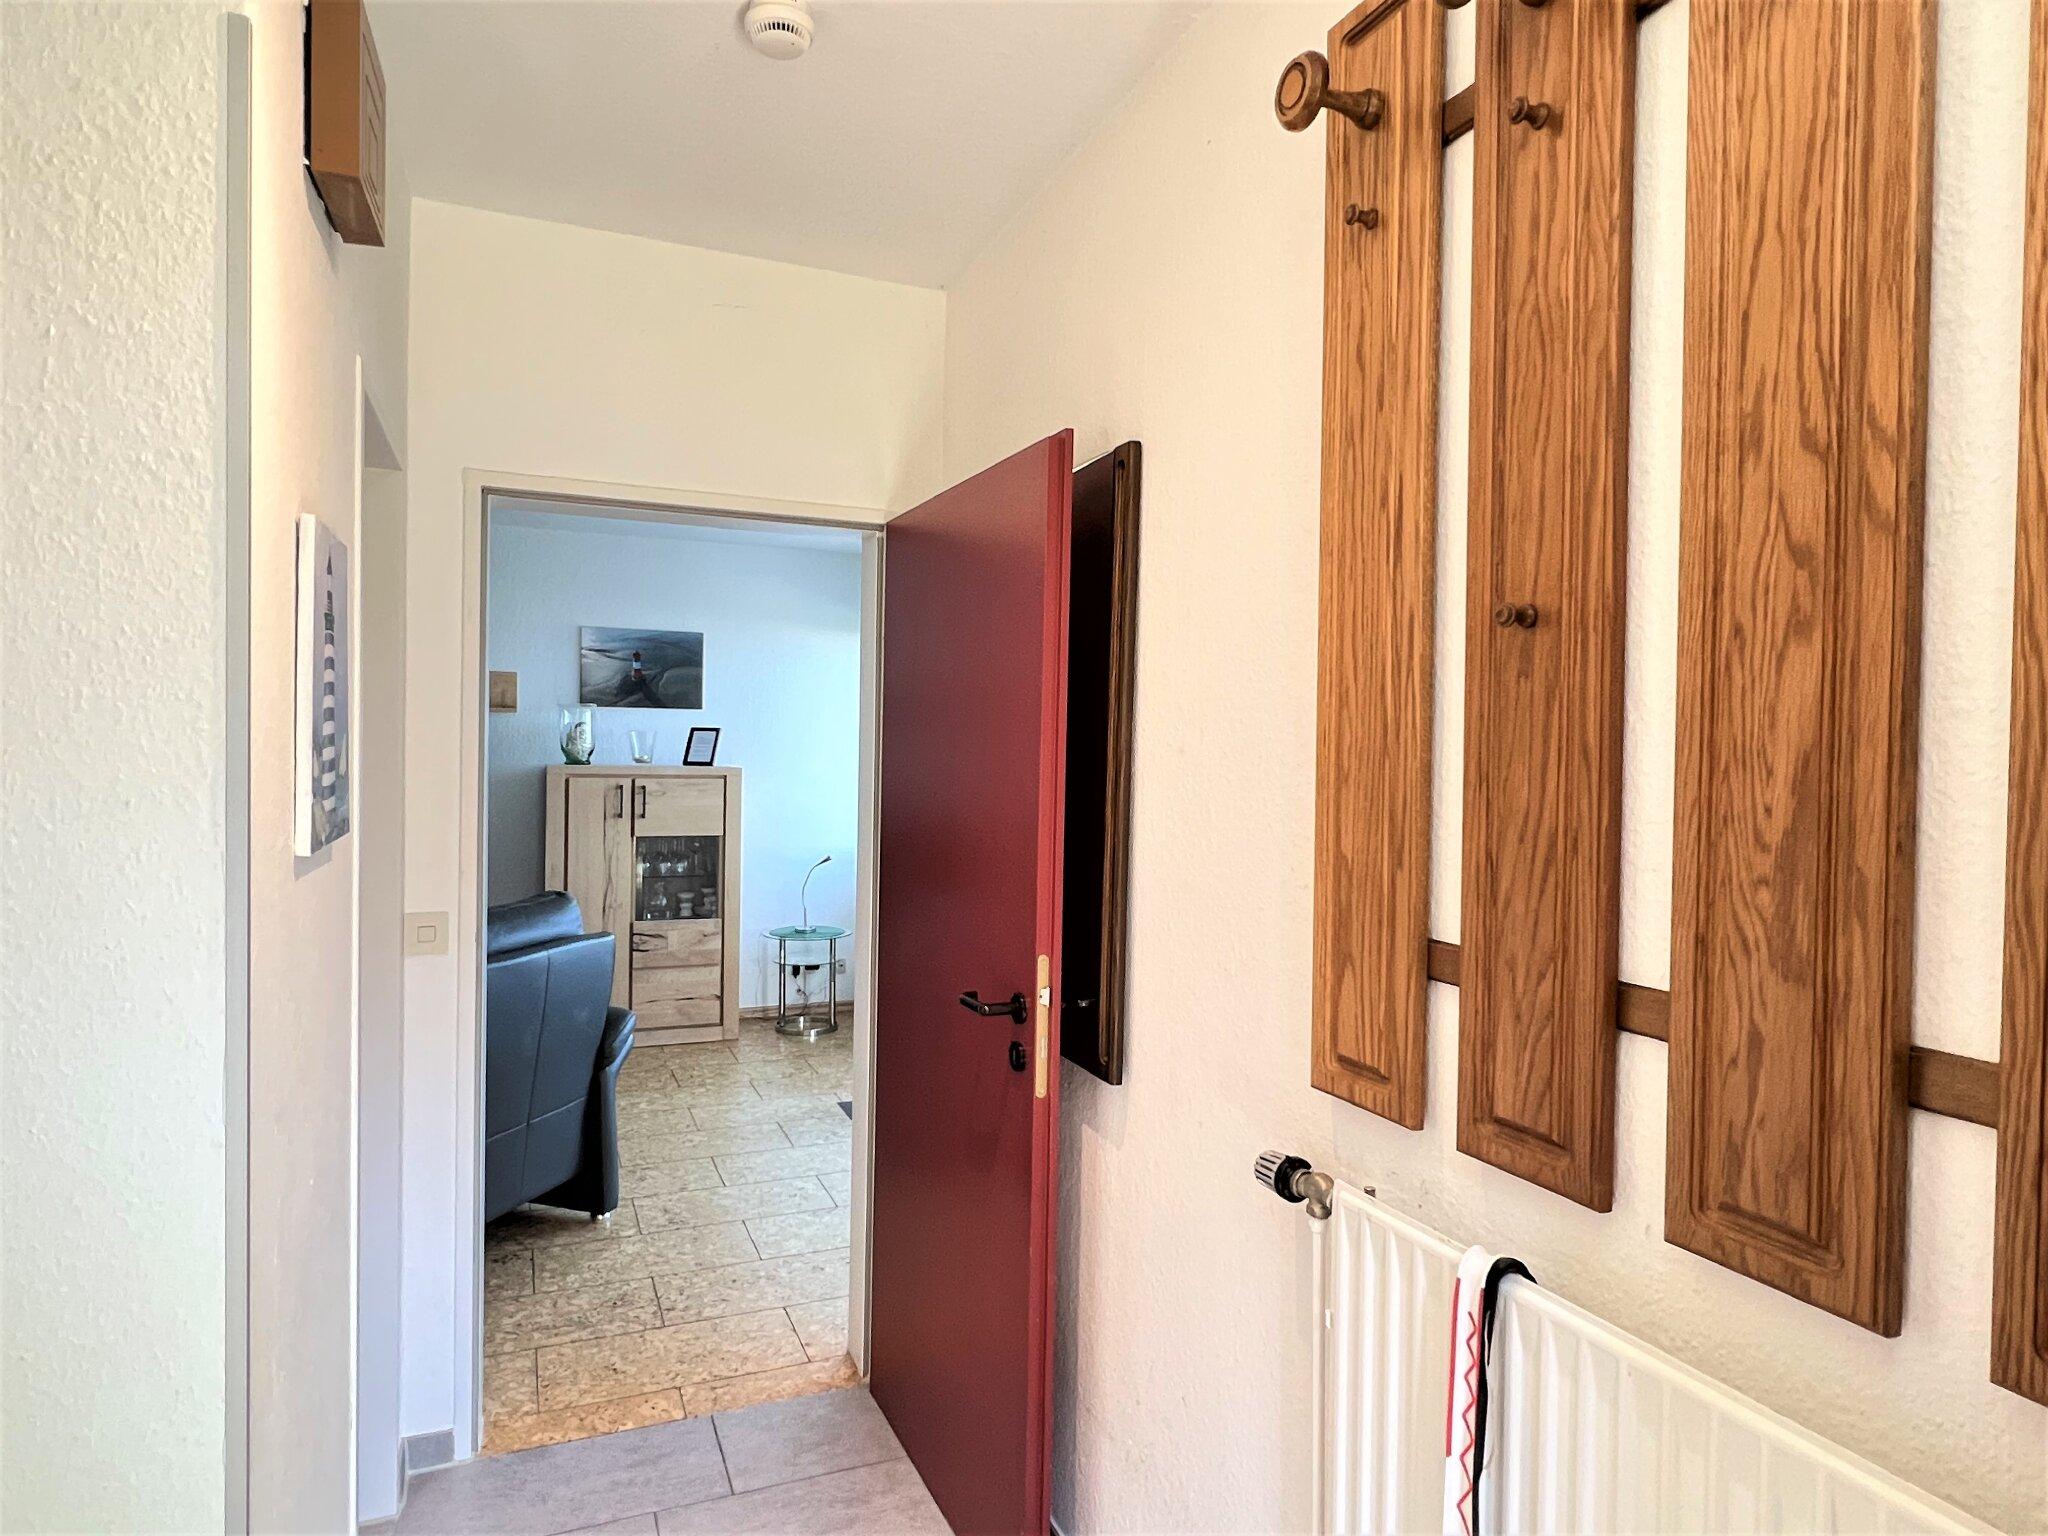 Die charmante Wohnküche